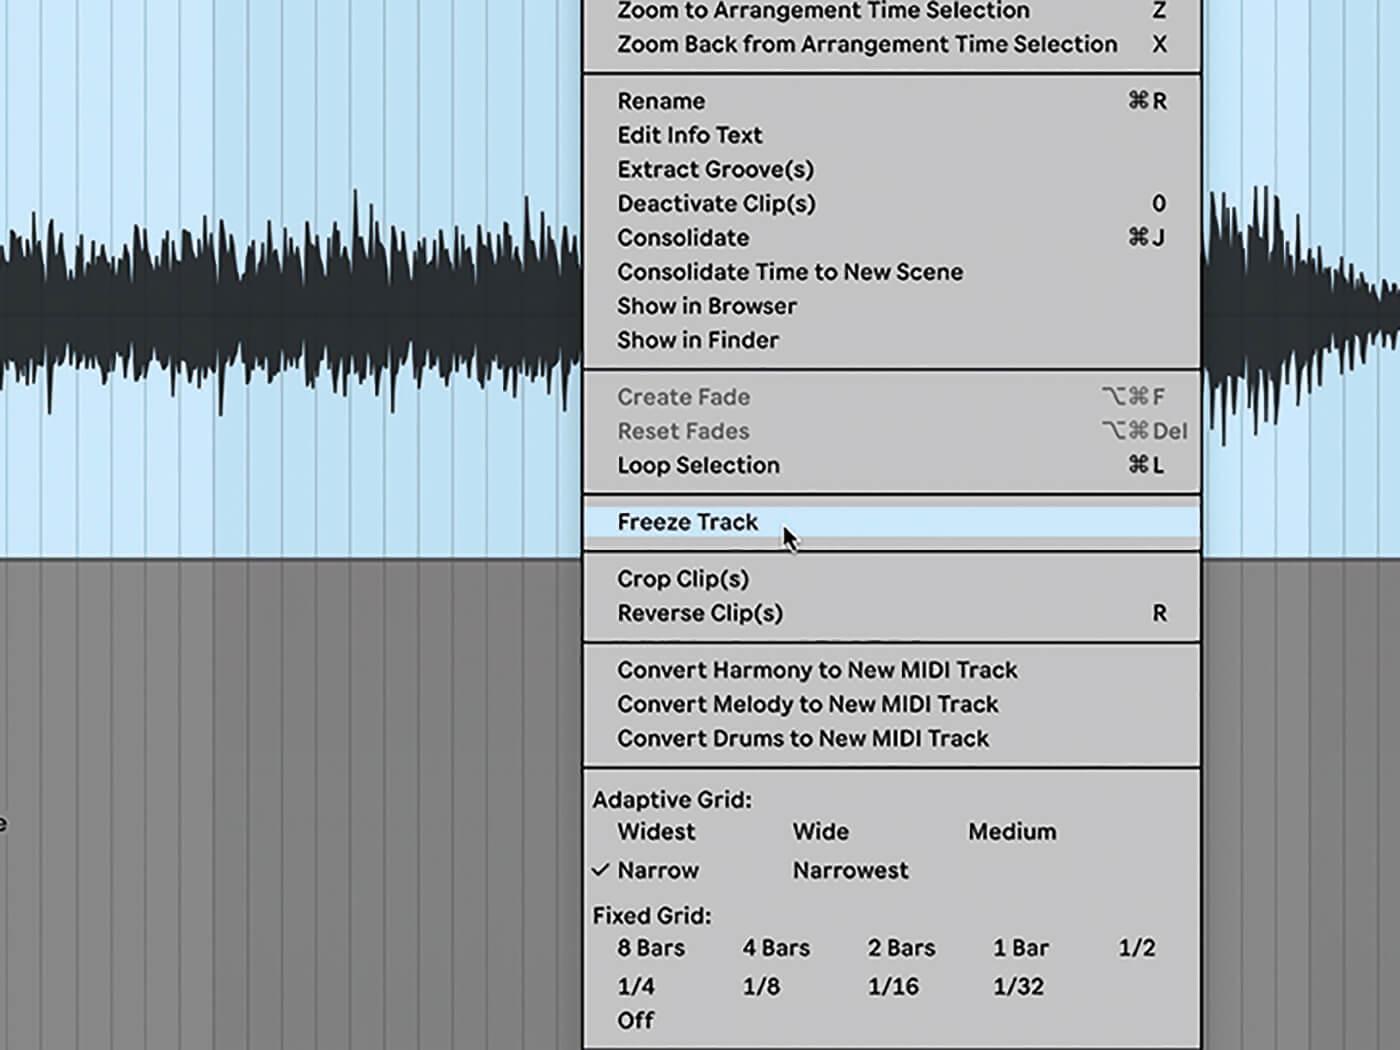 MT213 Ableton Live TUT 4